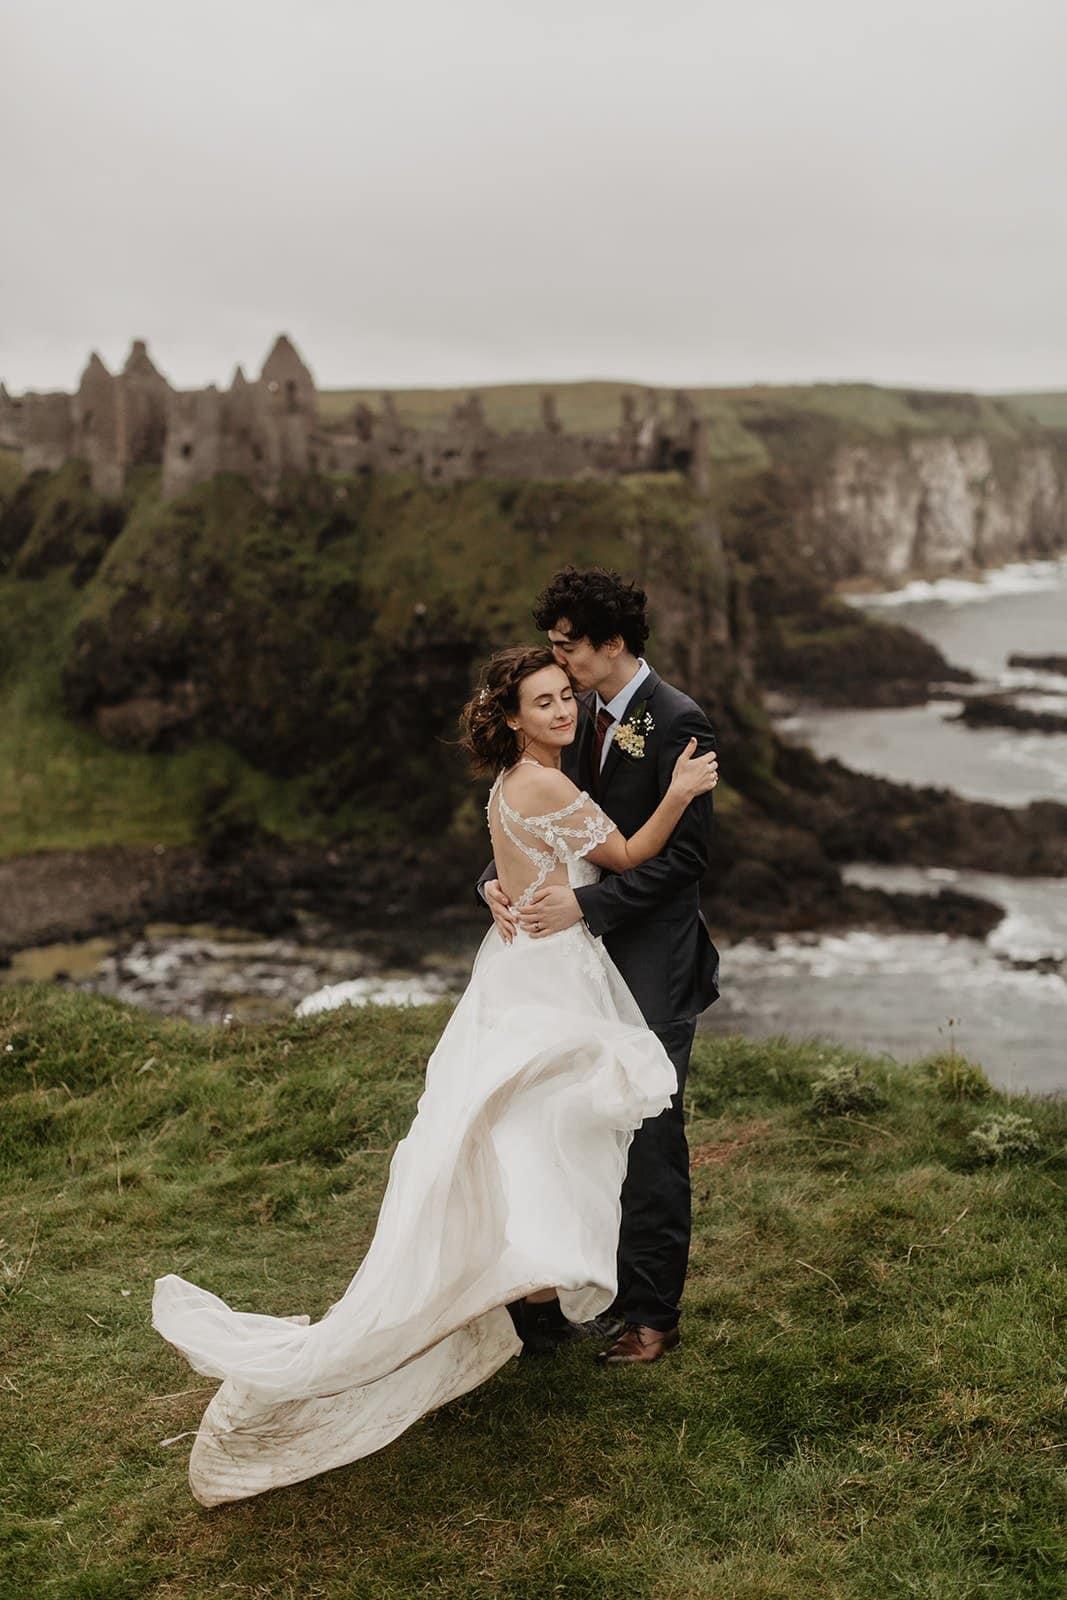 Dunluce Castle Elopement in Northern Ireland